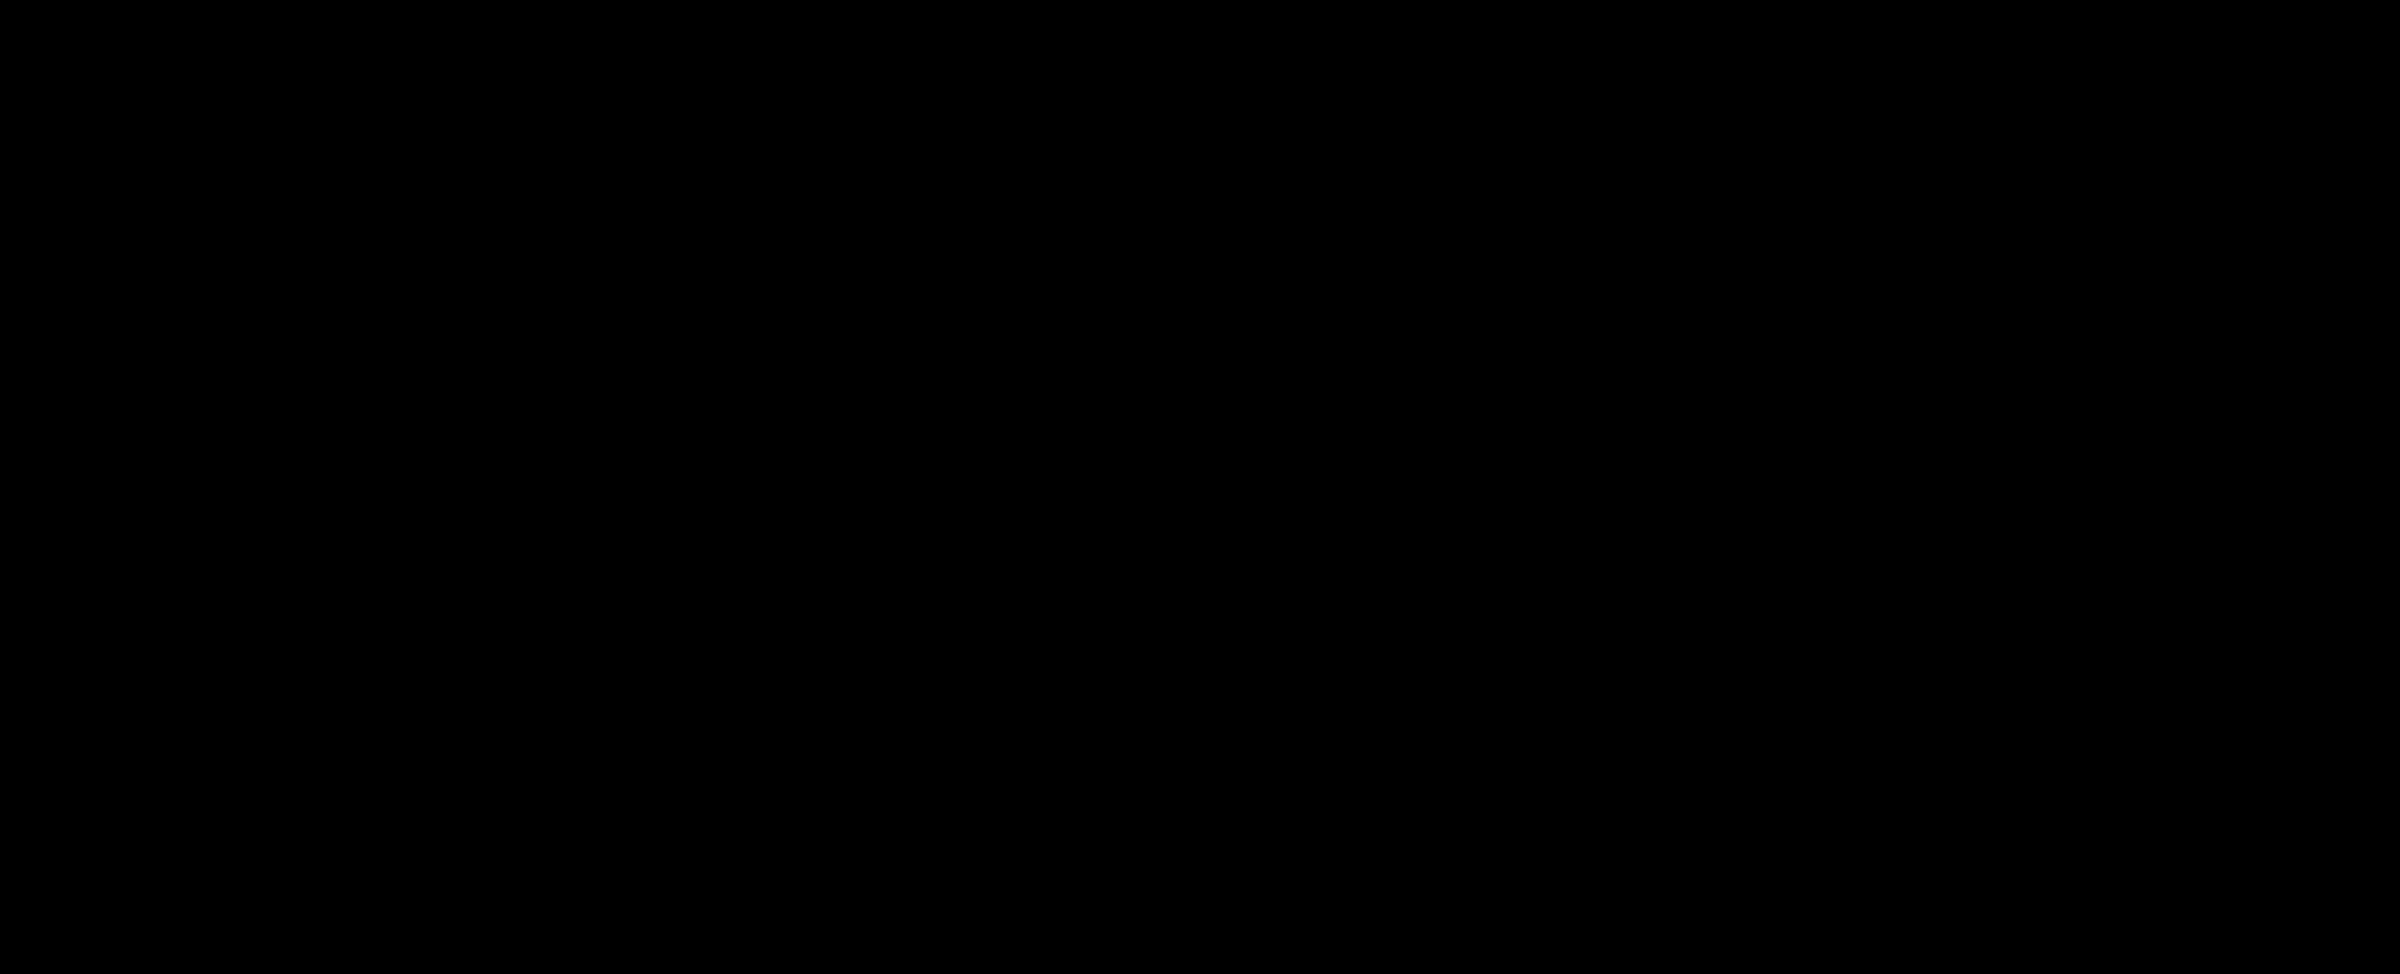 Clipart - Raygun Glyph Dingbat